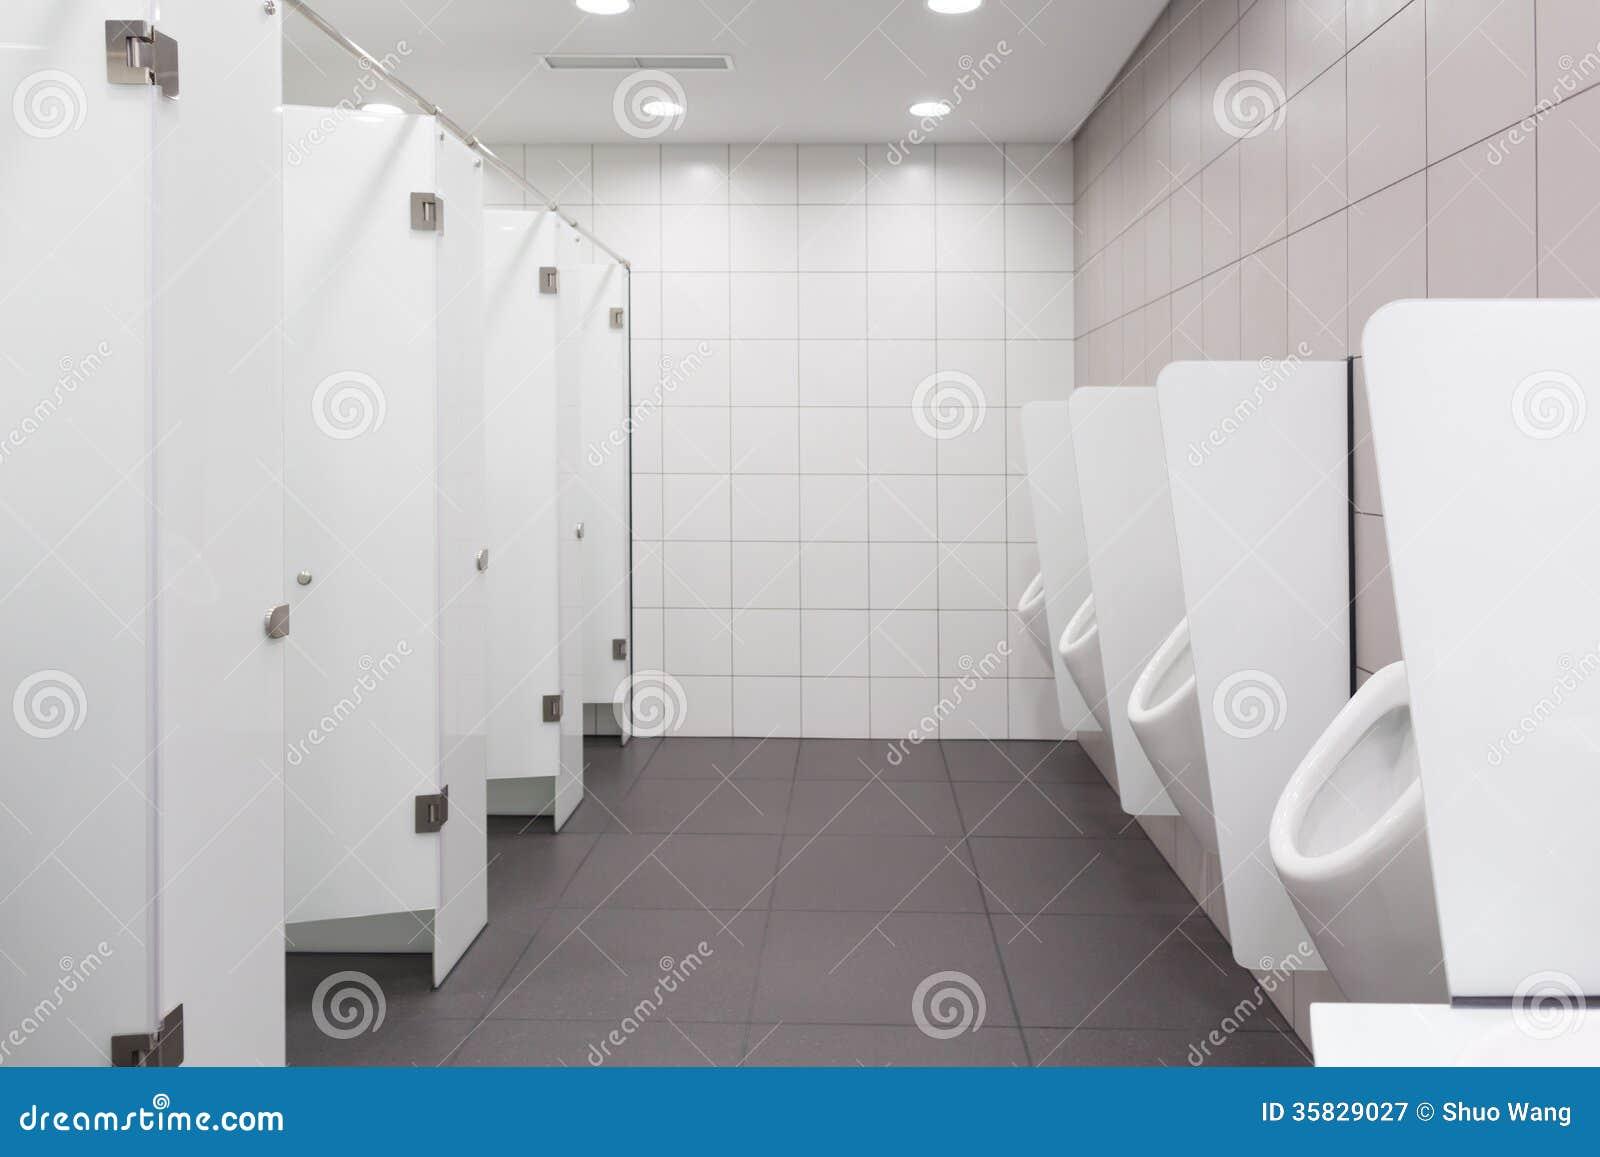 WC for men